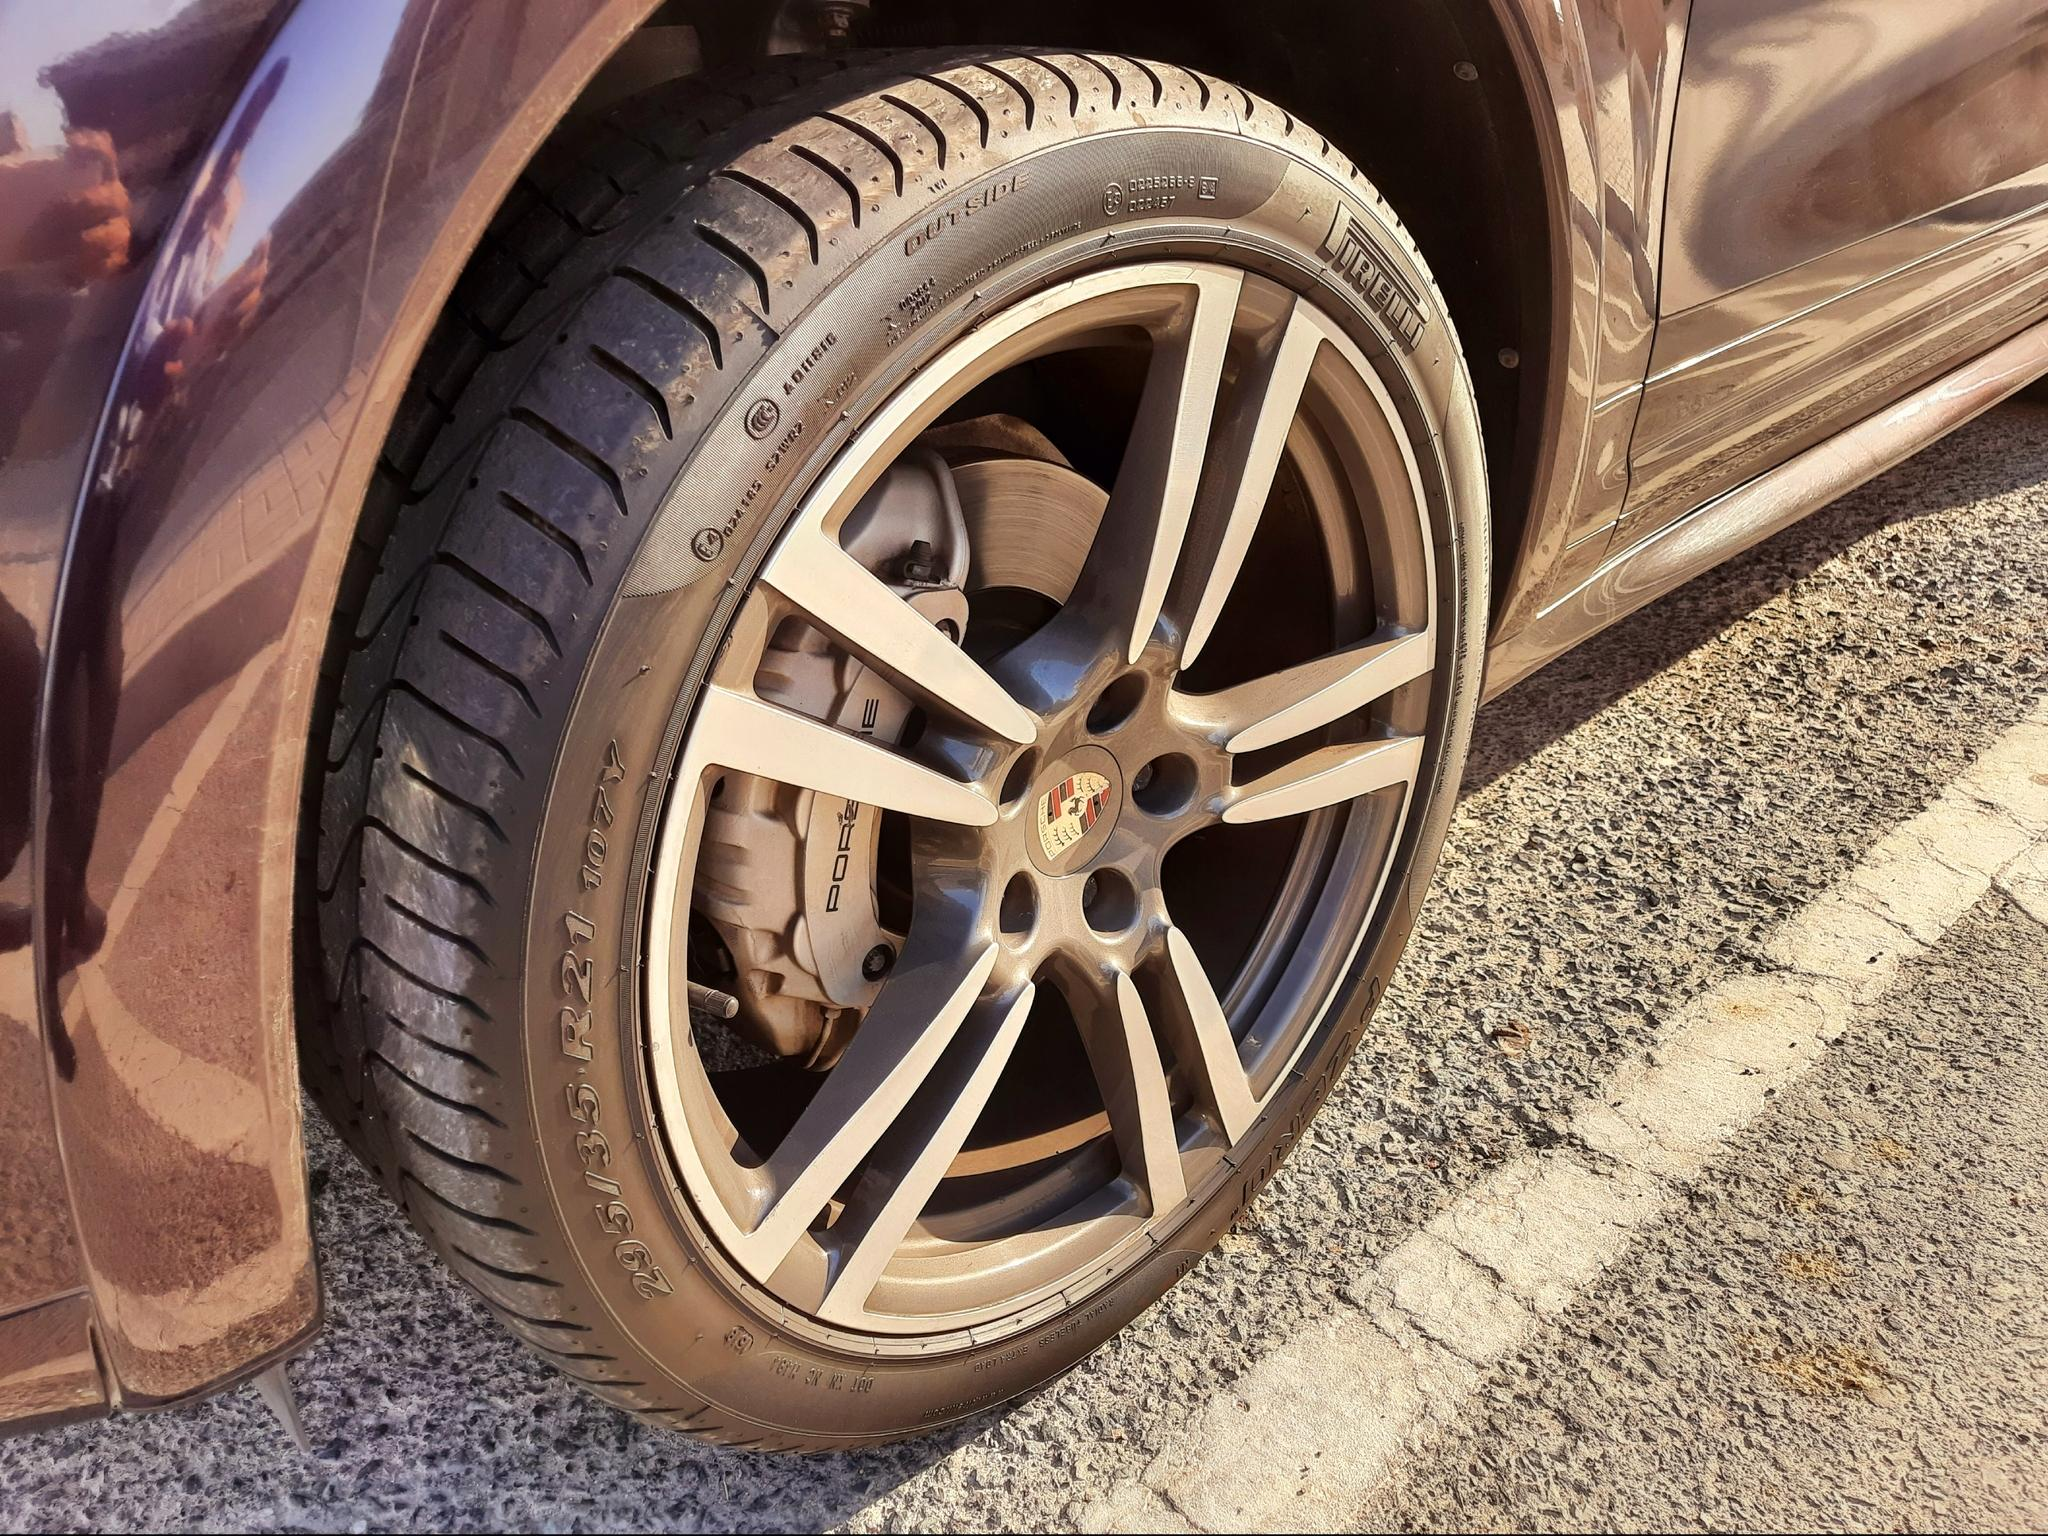 Porsche Cayenne S - Immaculate condition